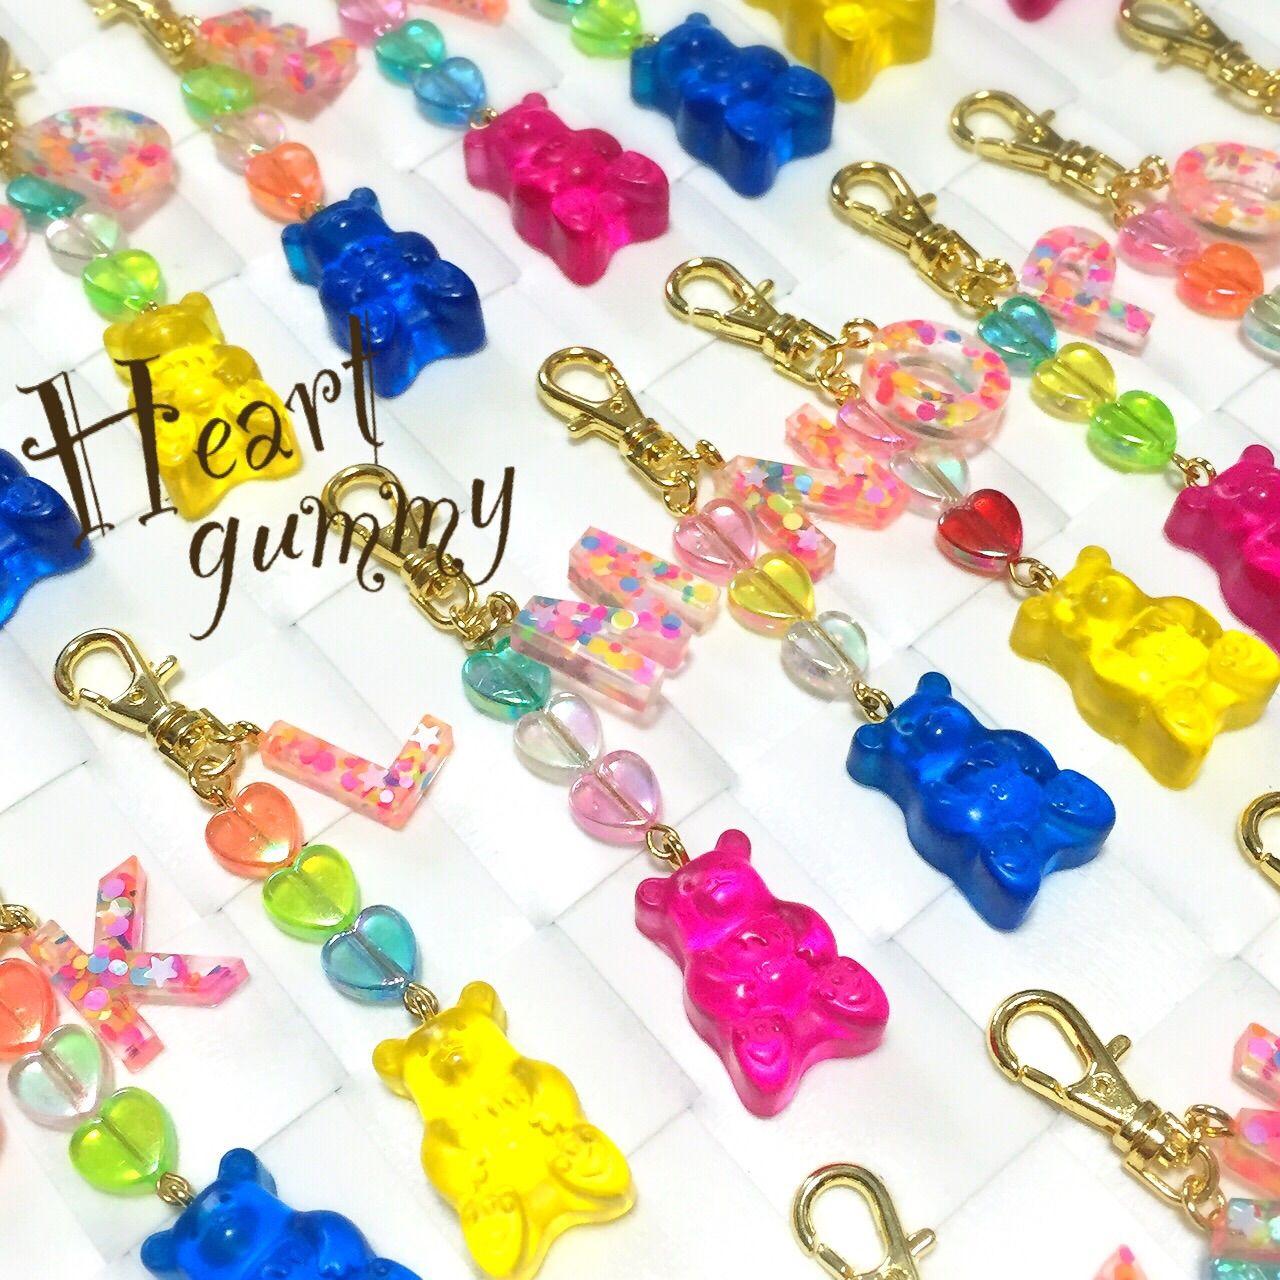 Heart gummy